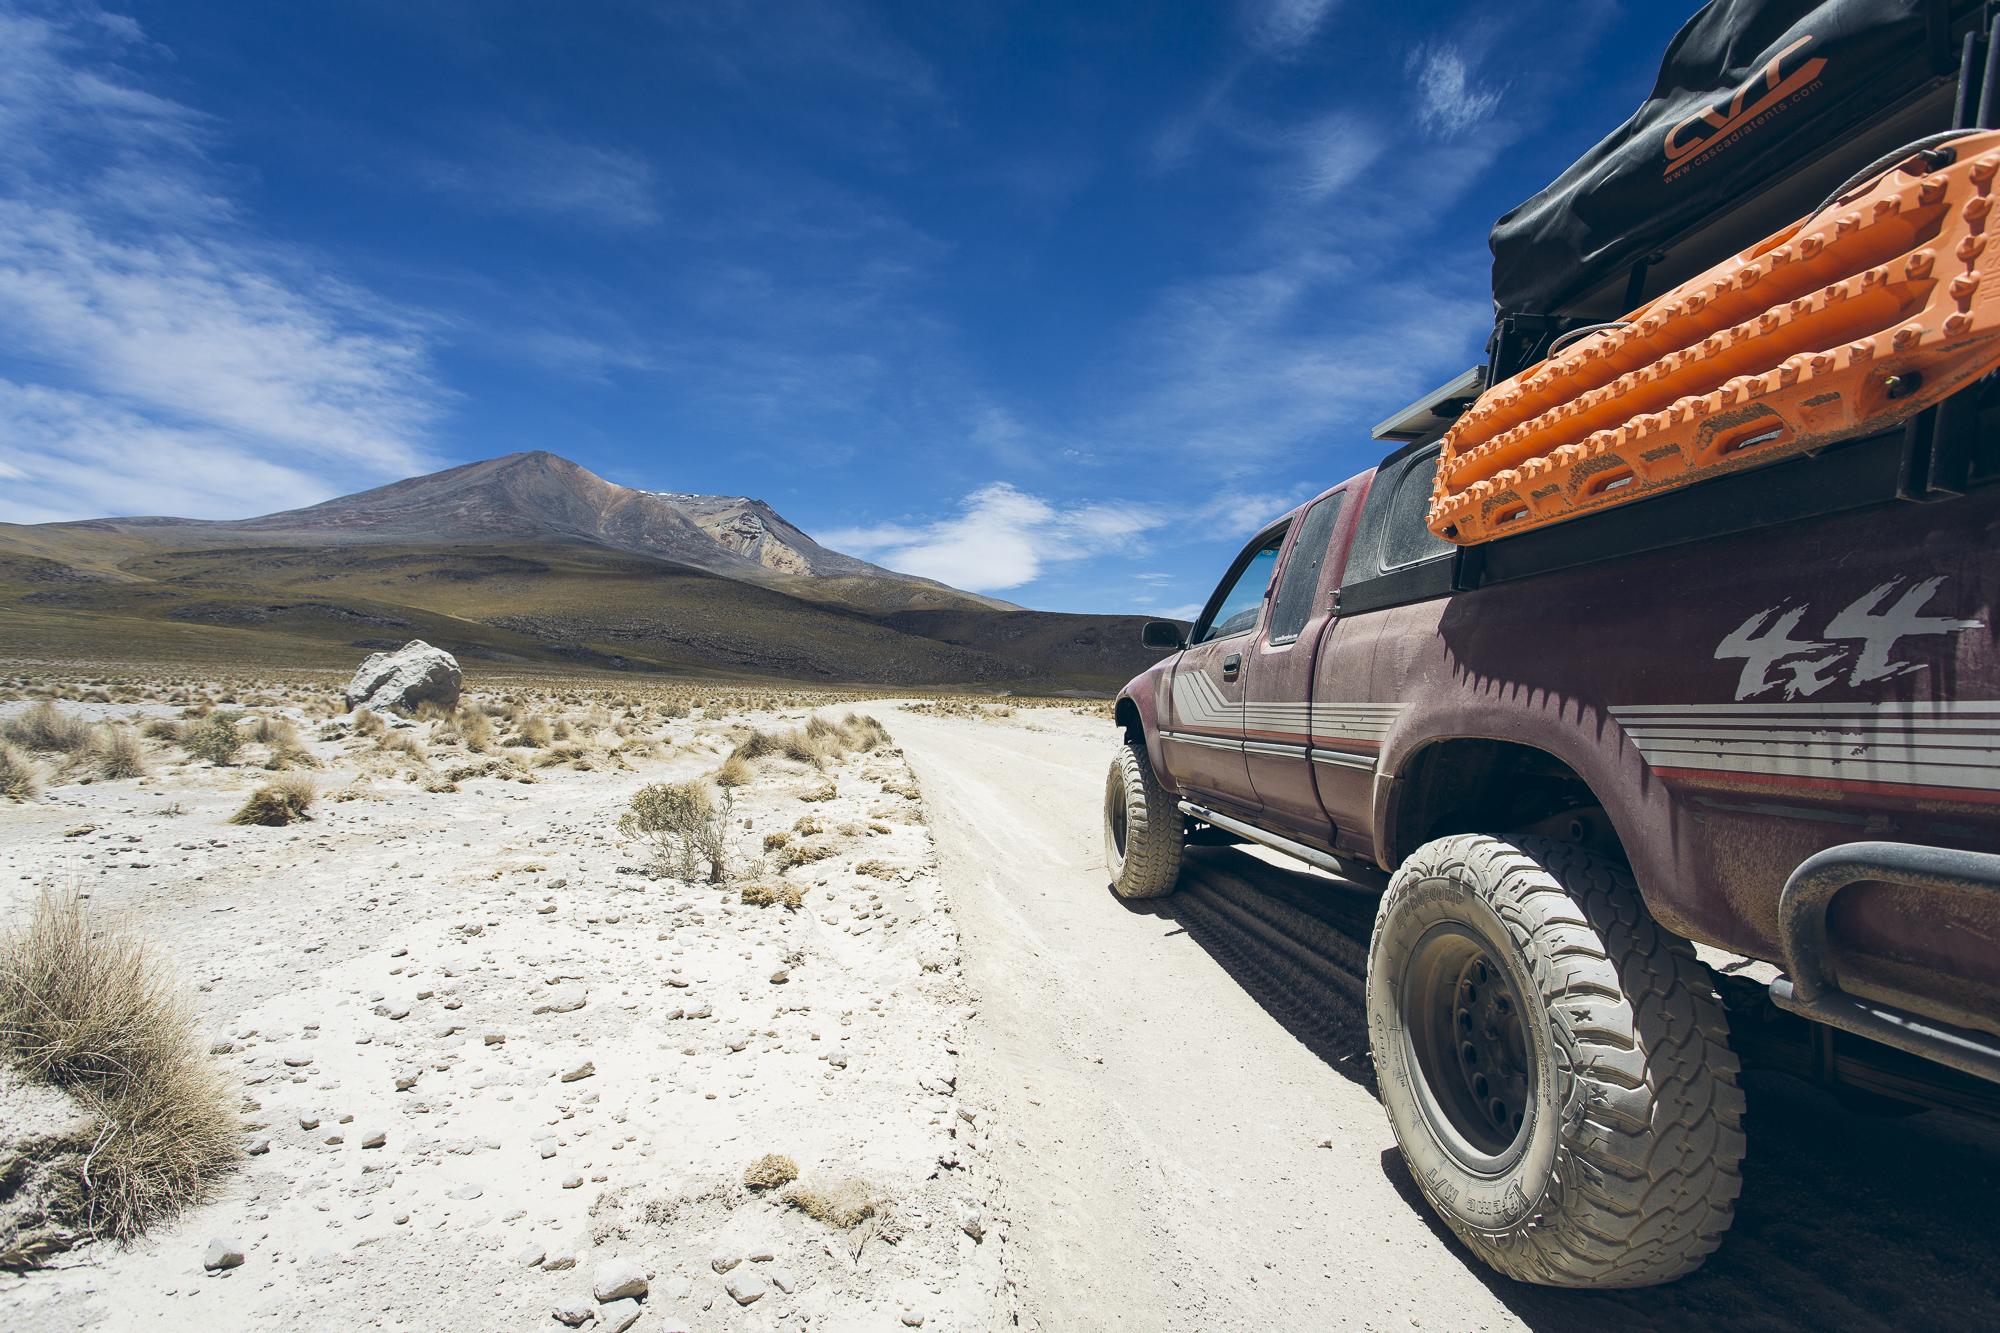 d2g_expo_lagunas_route_day_2-3